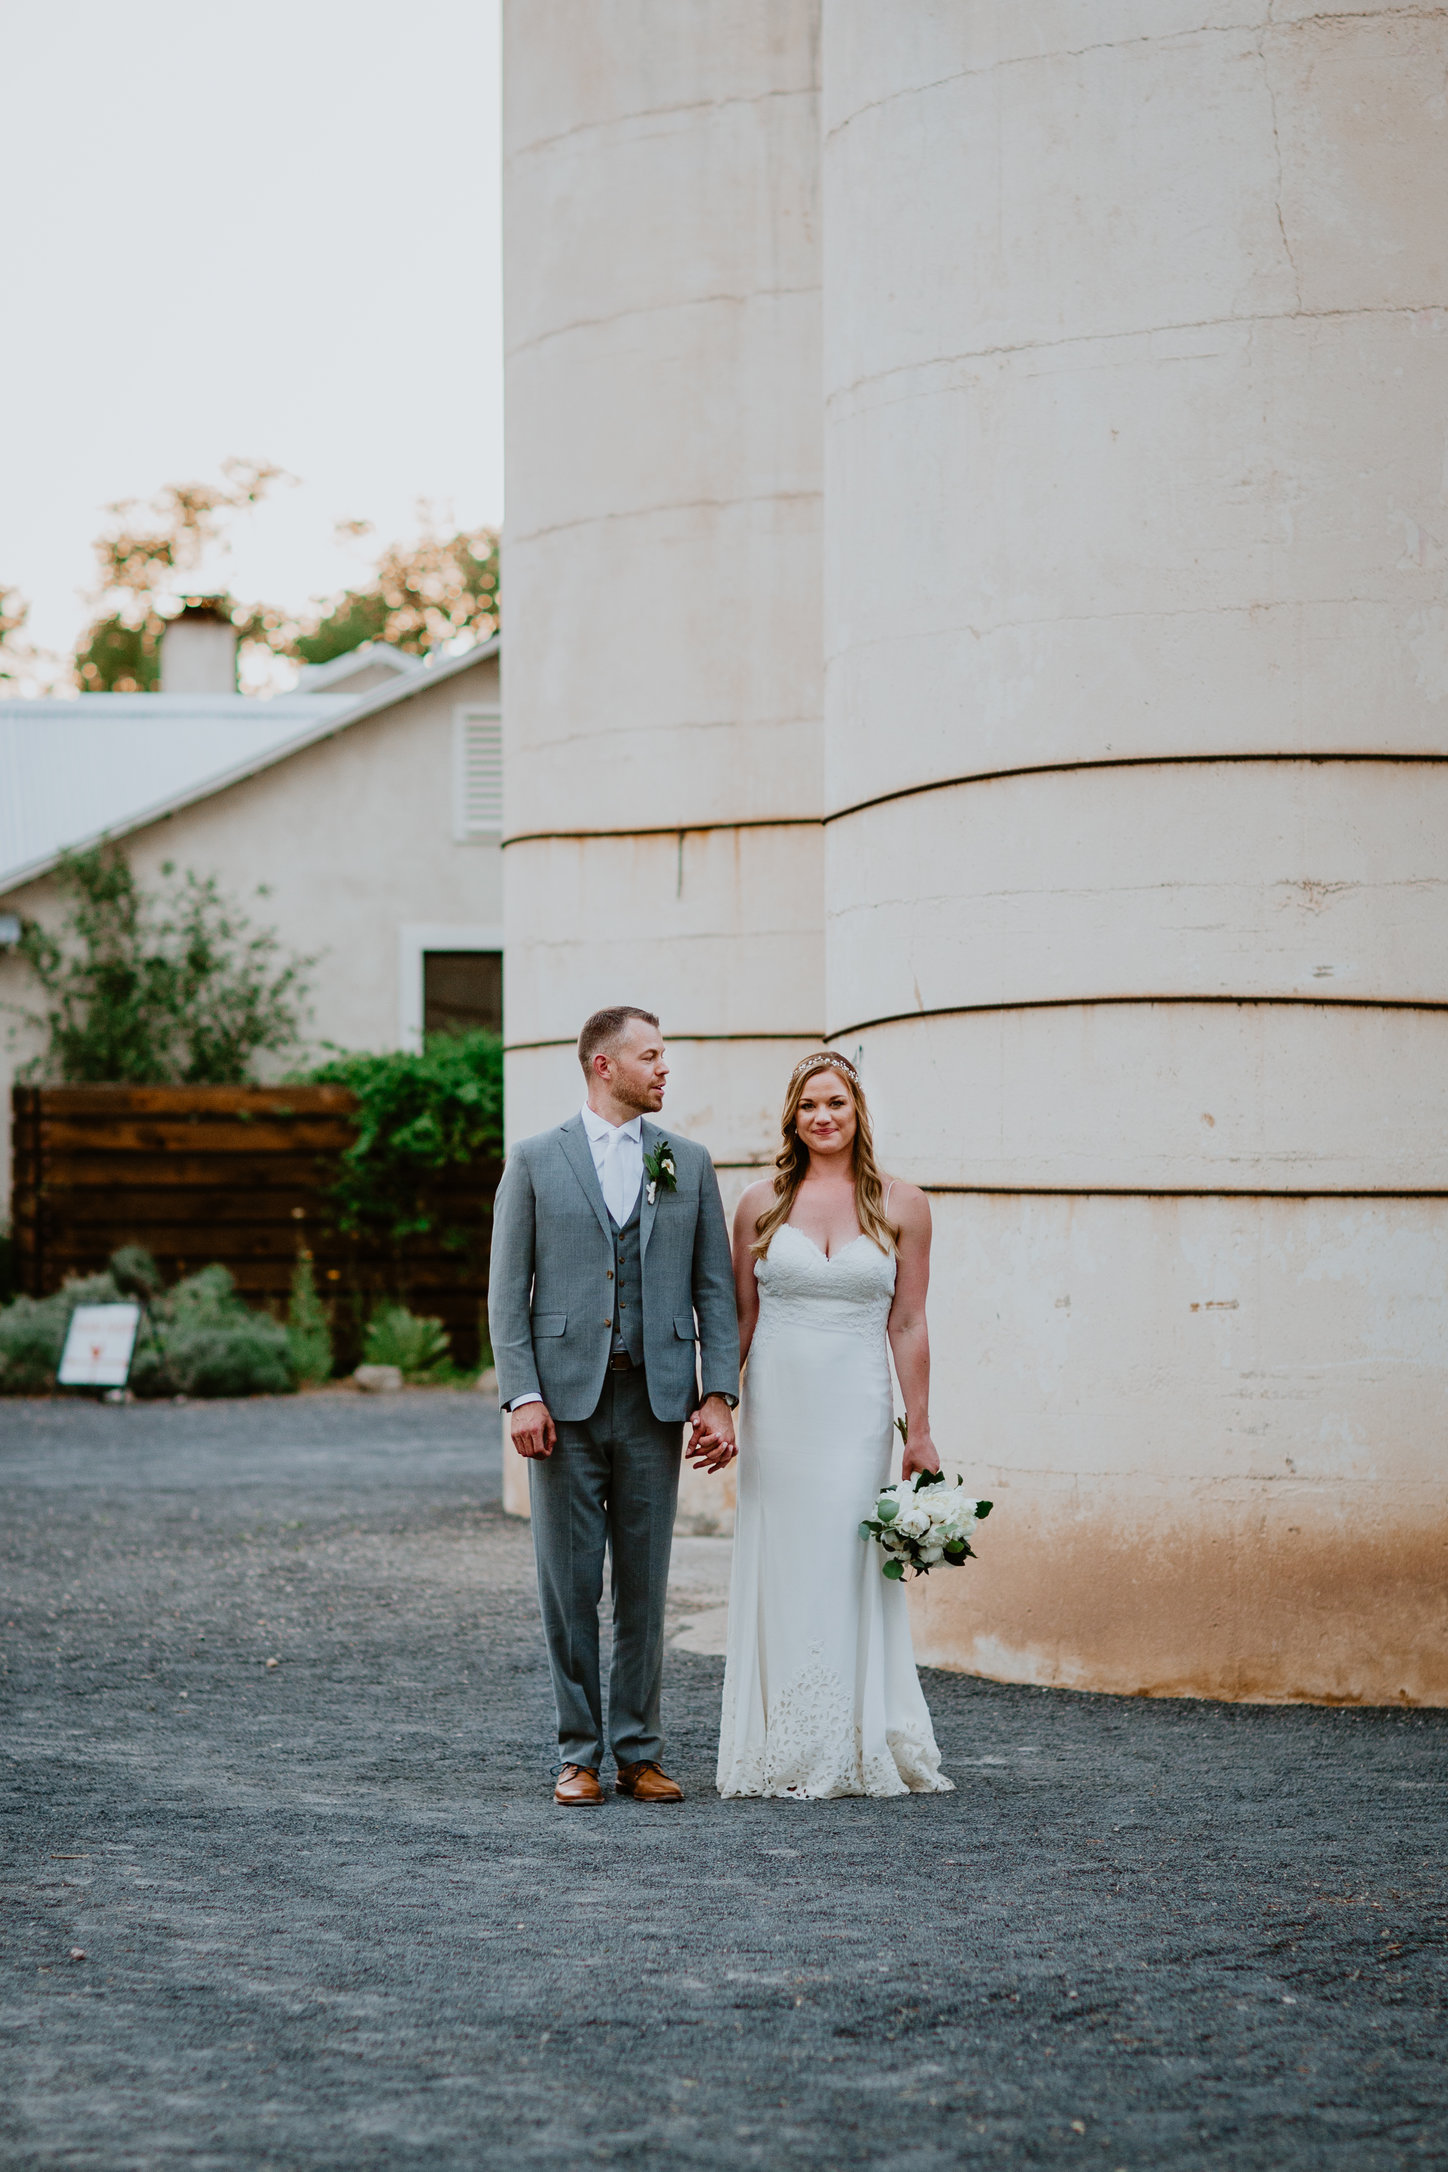 DandA-wedding-753.jpg